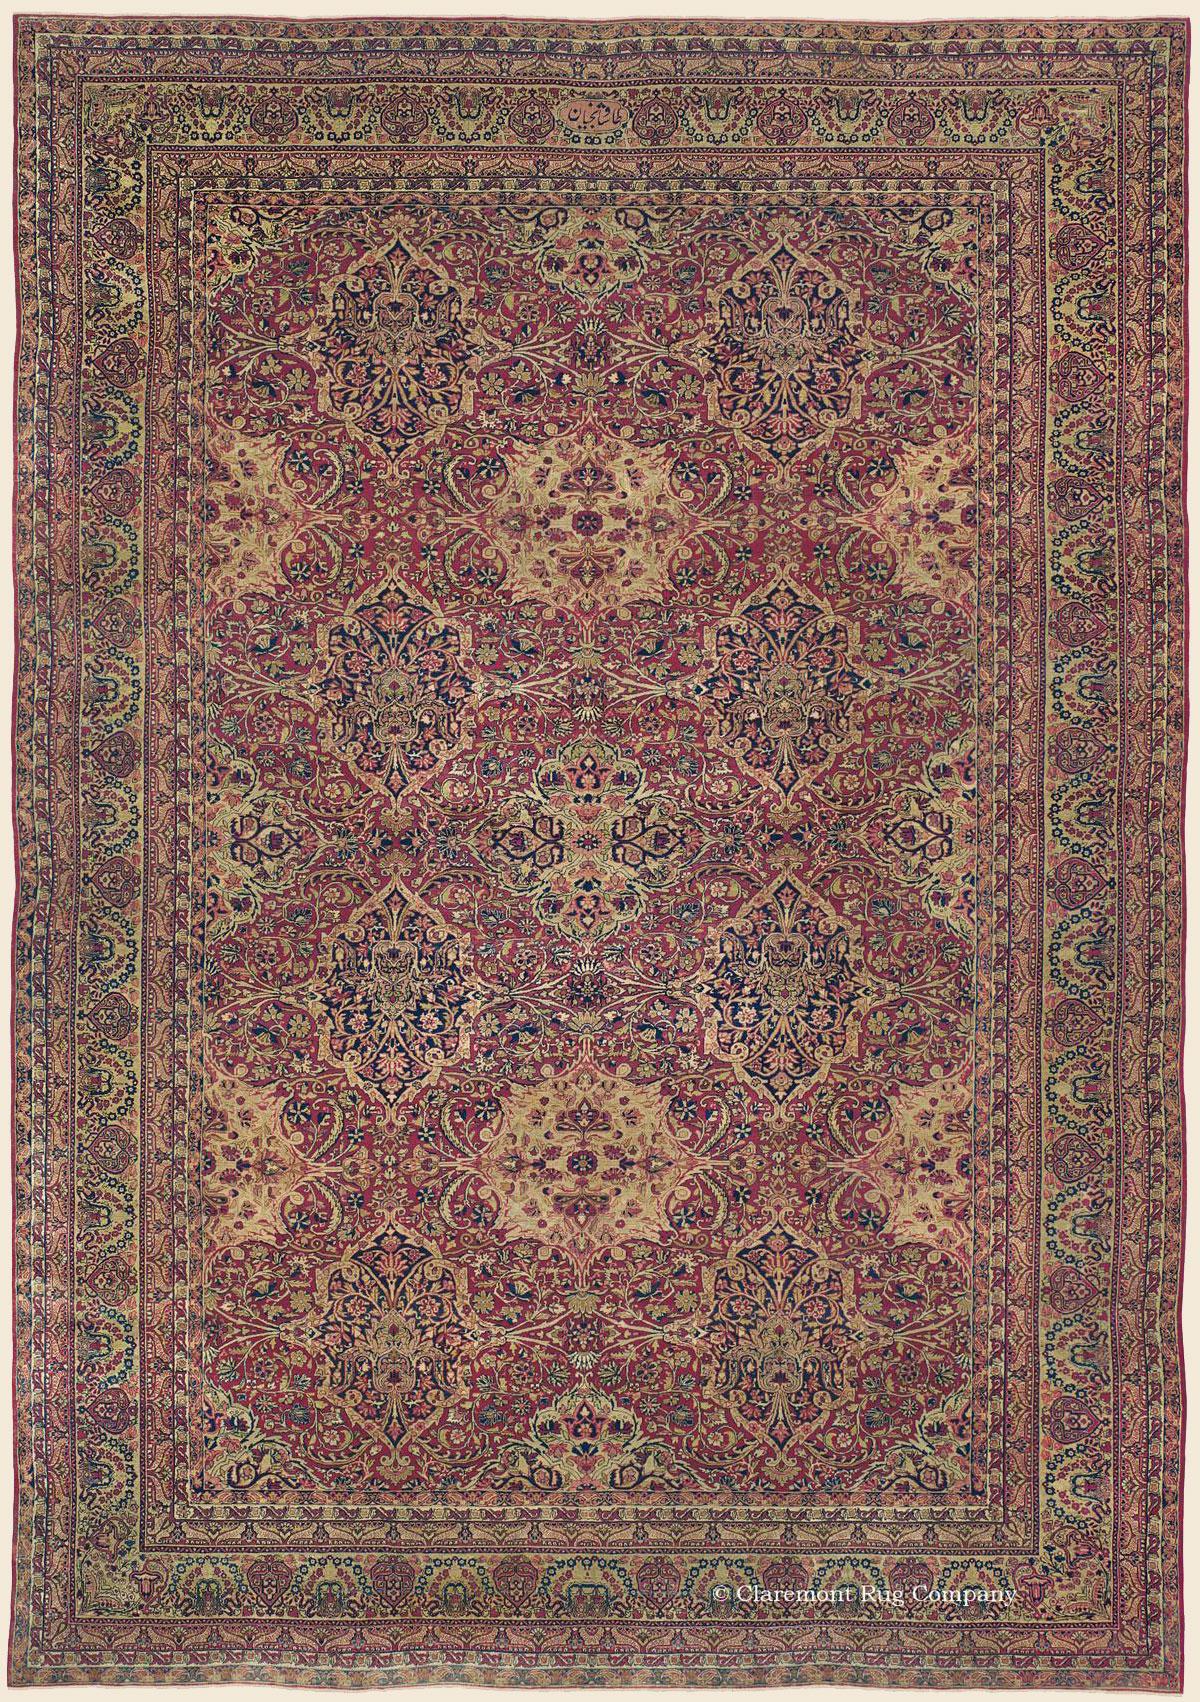 Laver Kirman Southeast Persian Antique Rug Claremont